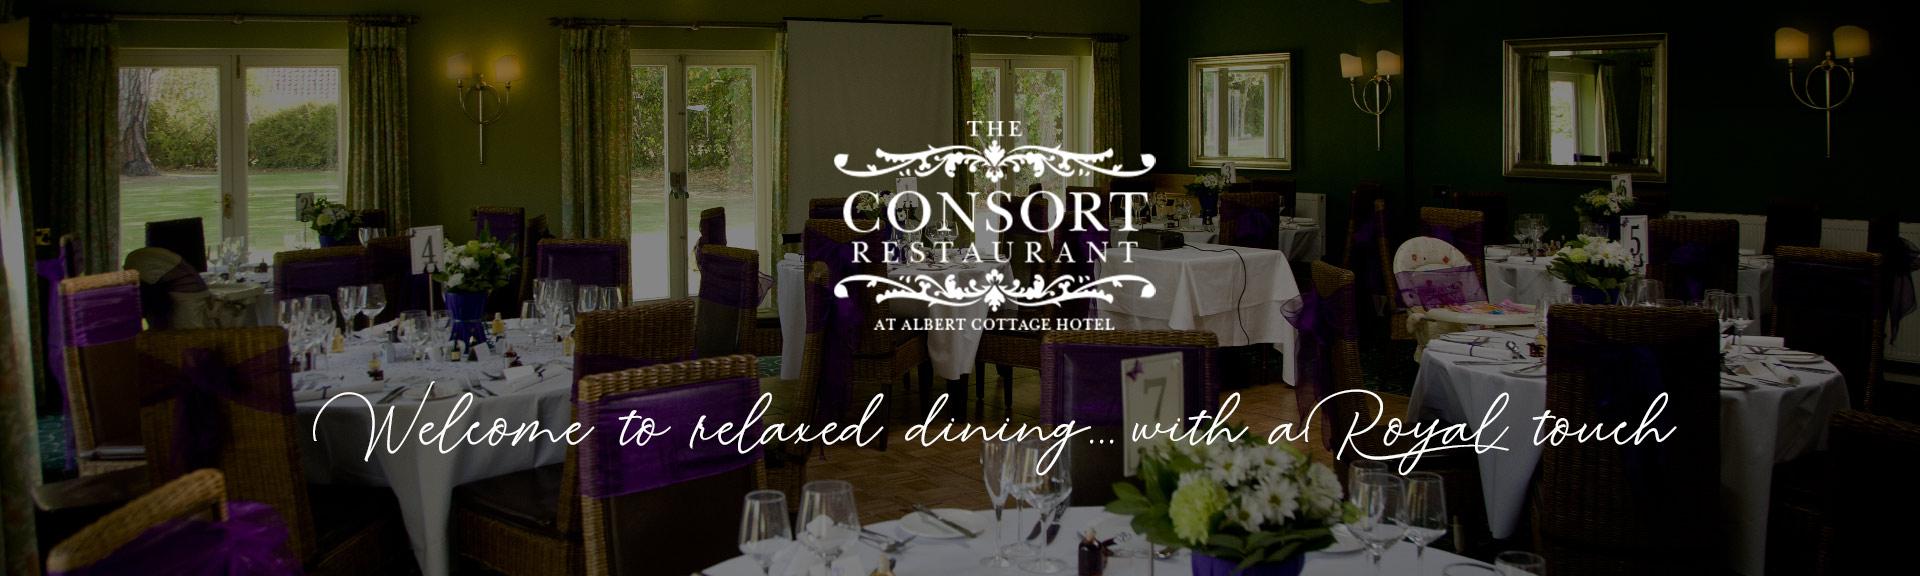 Consort Restaurant & Bar Banner